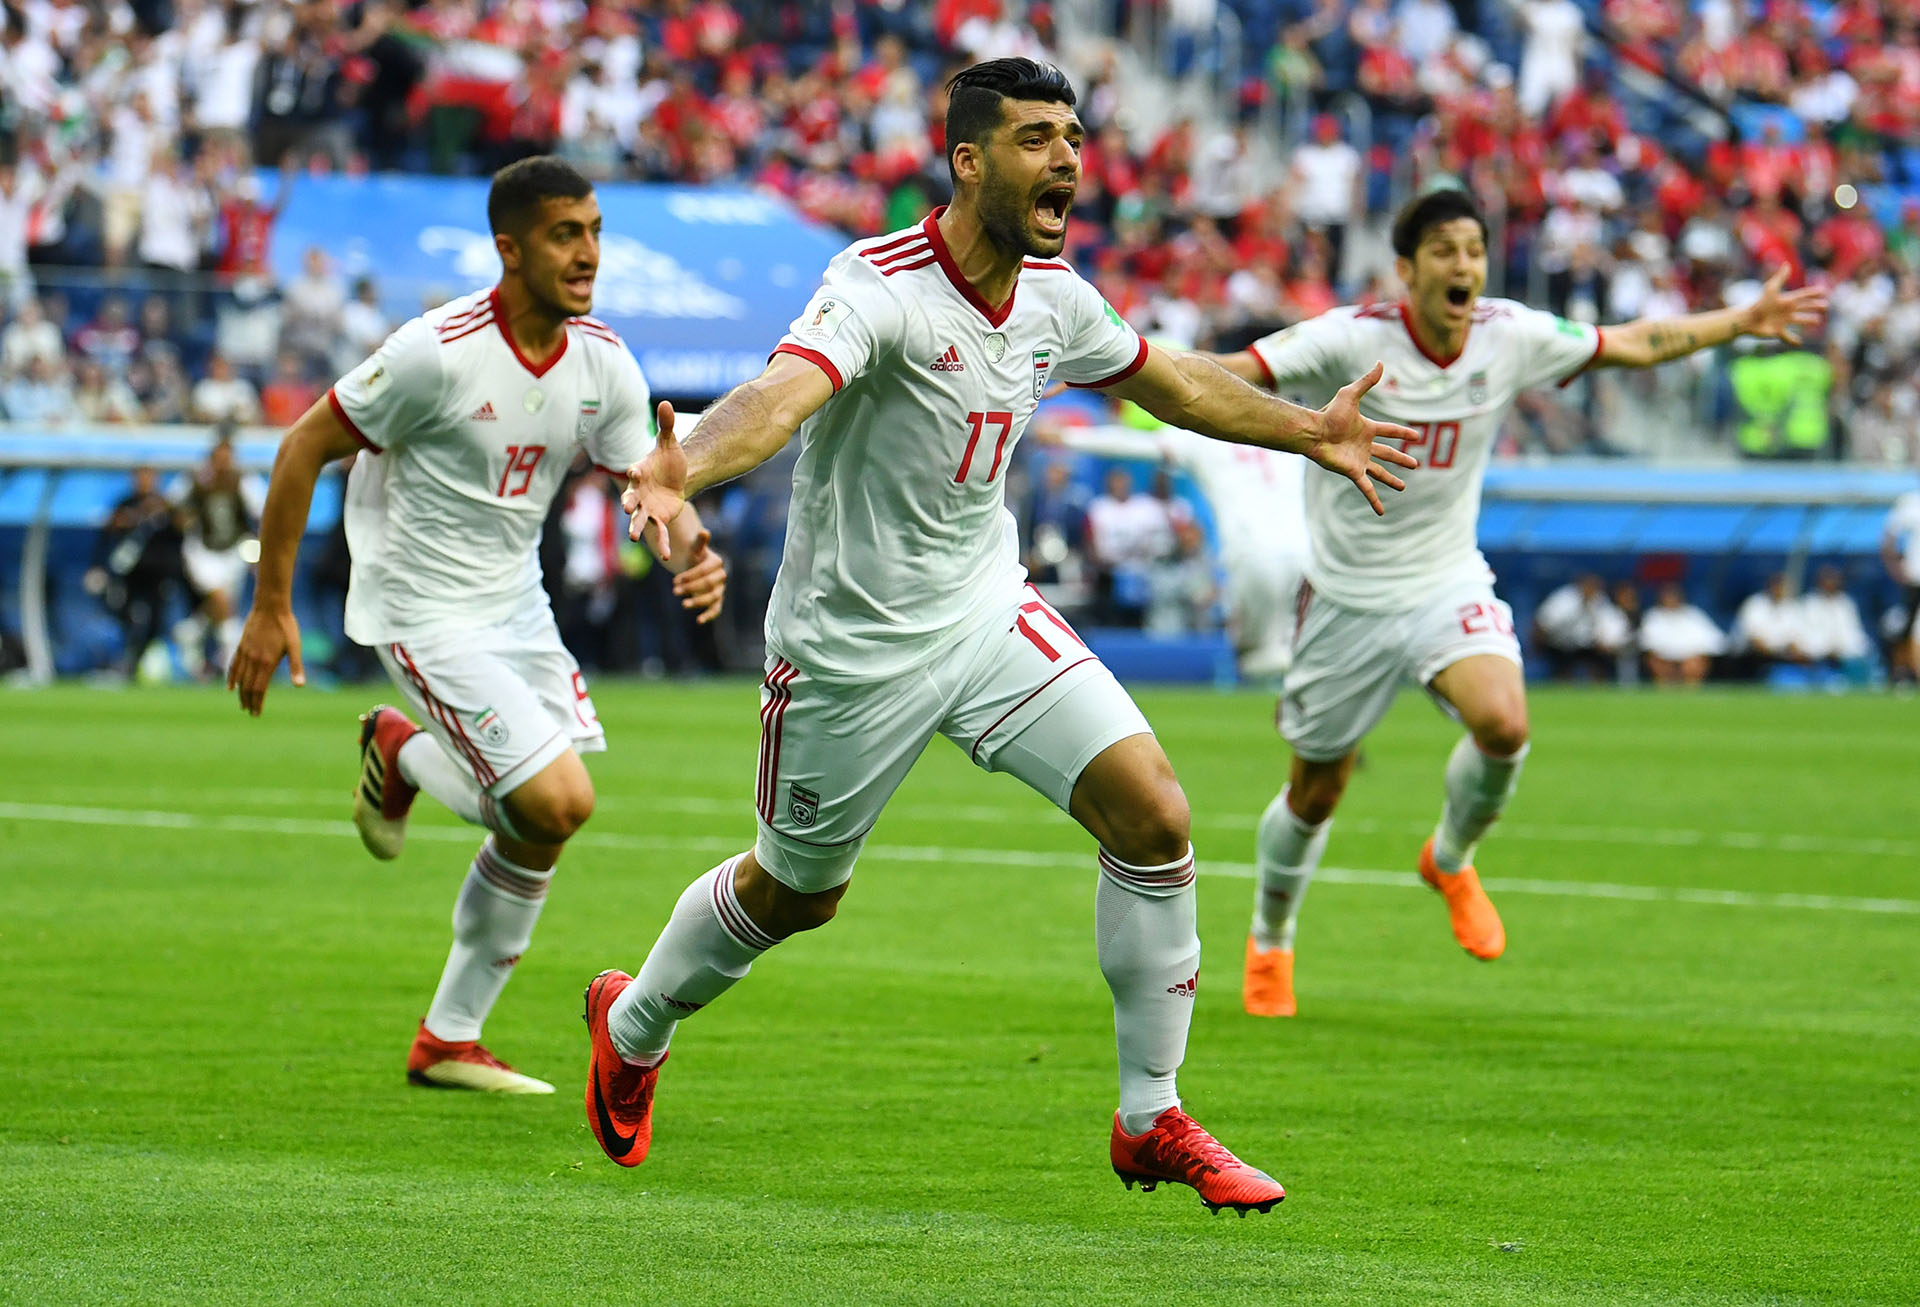 Soccer Football – World Cup – Group B – Morocco vs Iran – Saint Petersburg Stadium, Saint Petersburg, Russia – June 15, 2018 Iran's Mehdi Taremi, Majid Hosseini and Sardar Azmoun celebrate their first goal REUTERS/Dylan Martinez